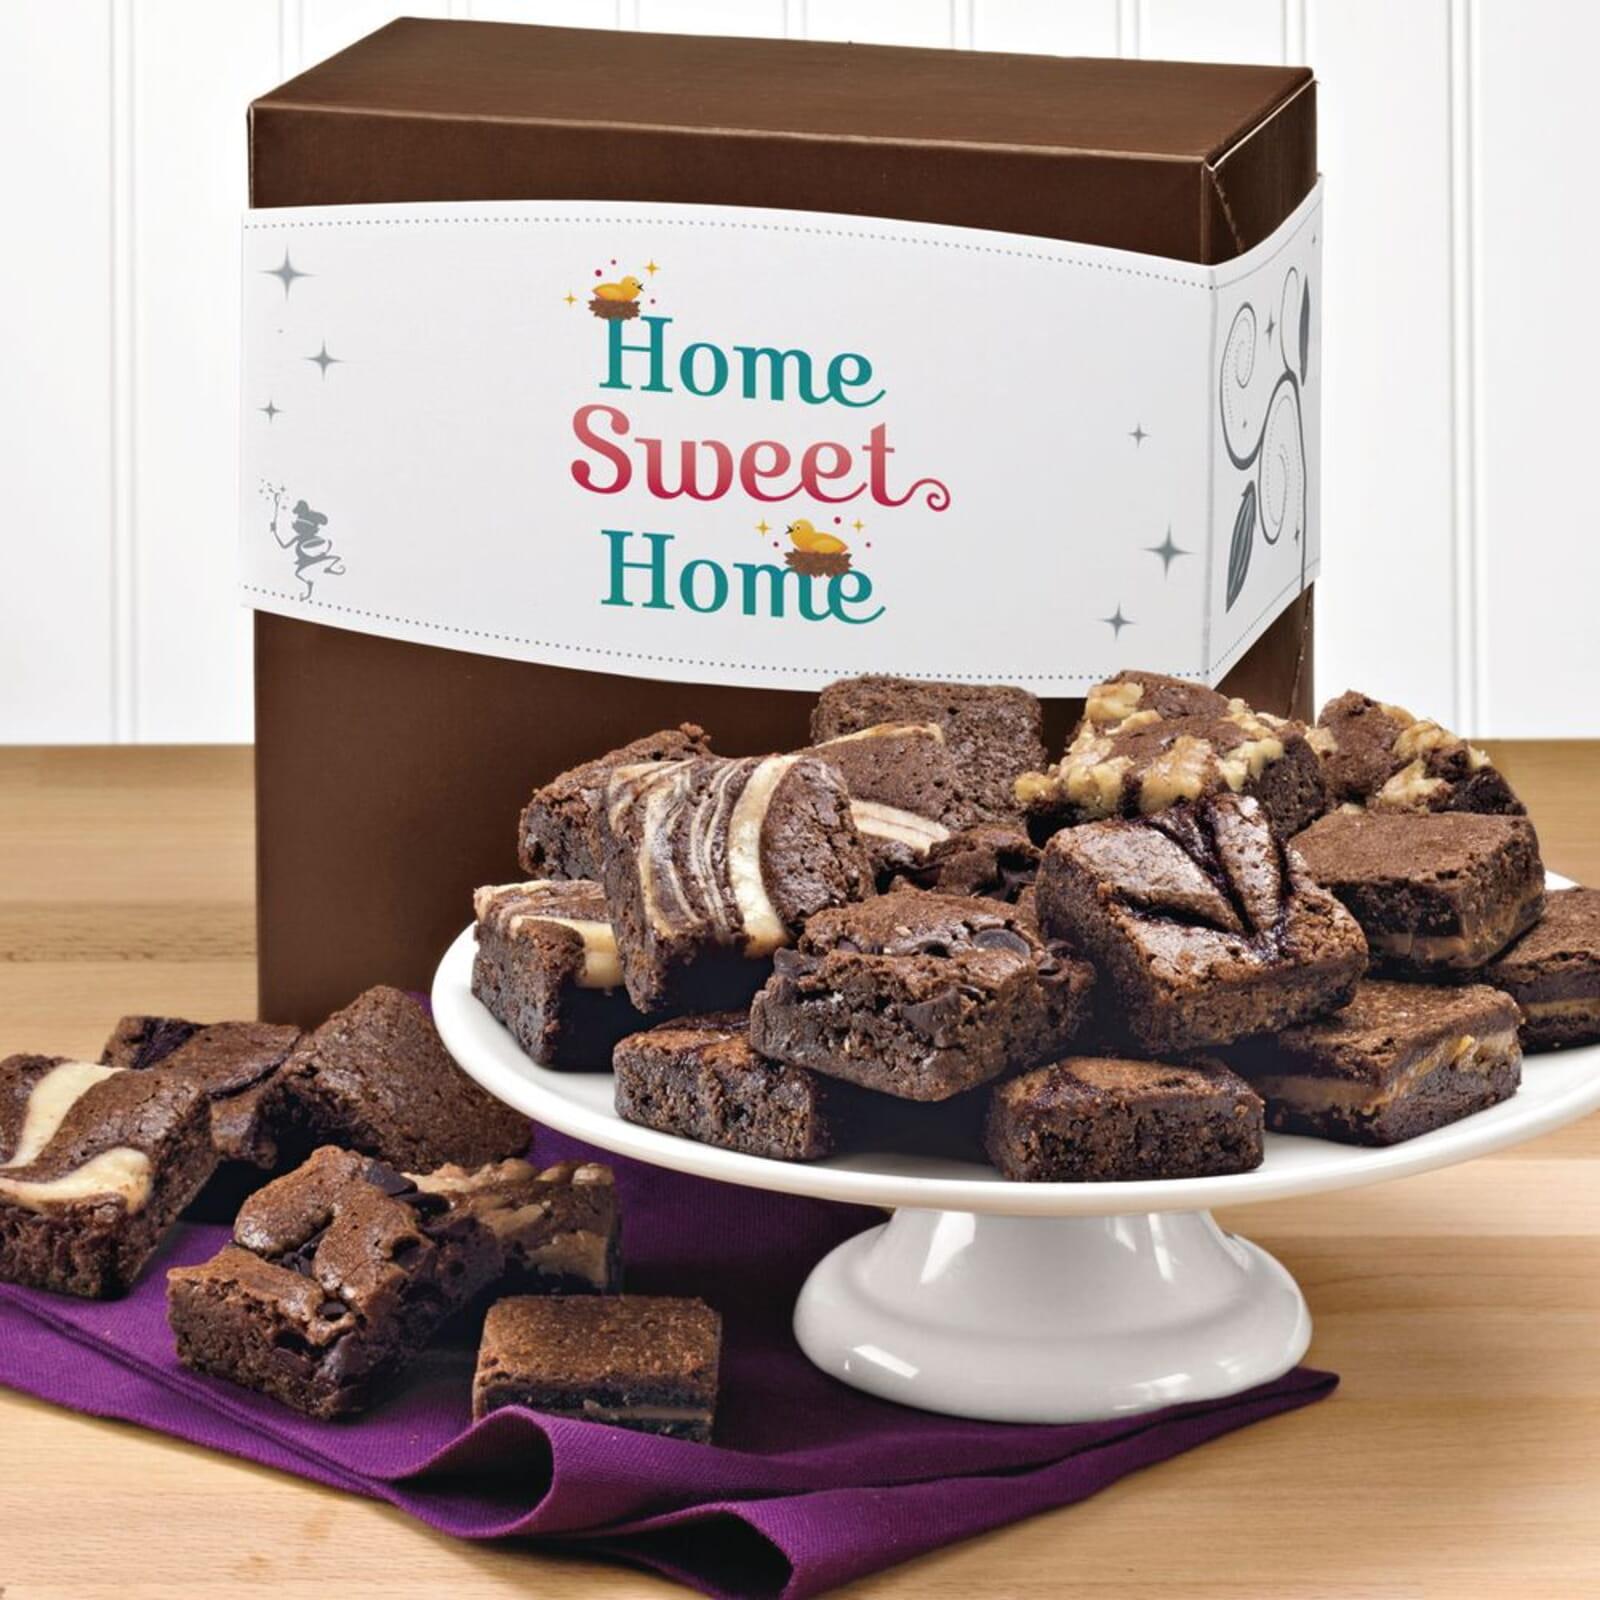 Home Sweet Home Morsel 24